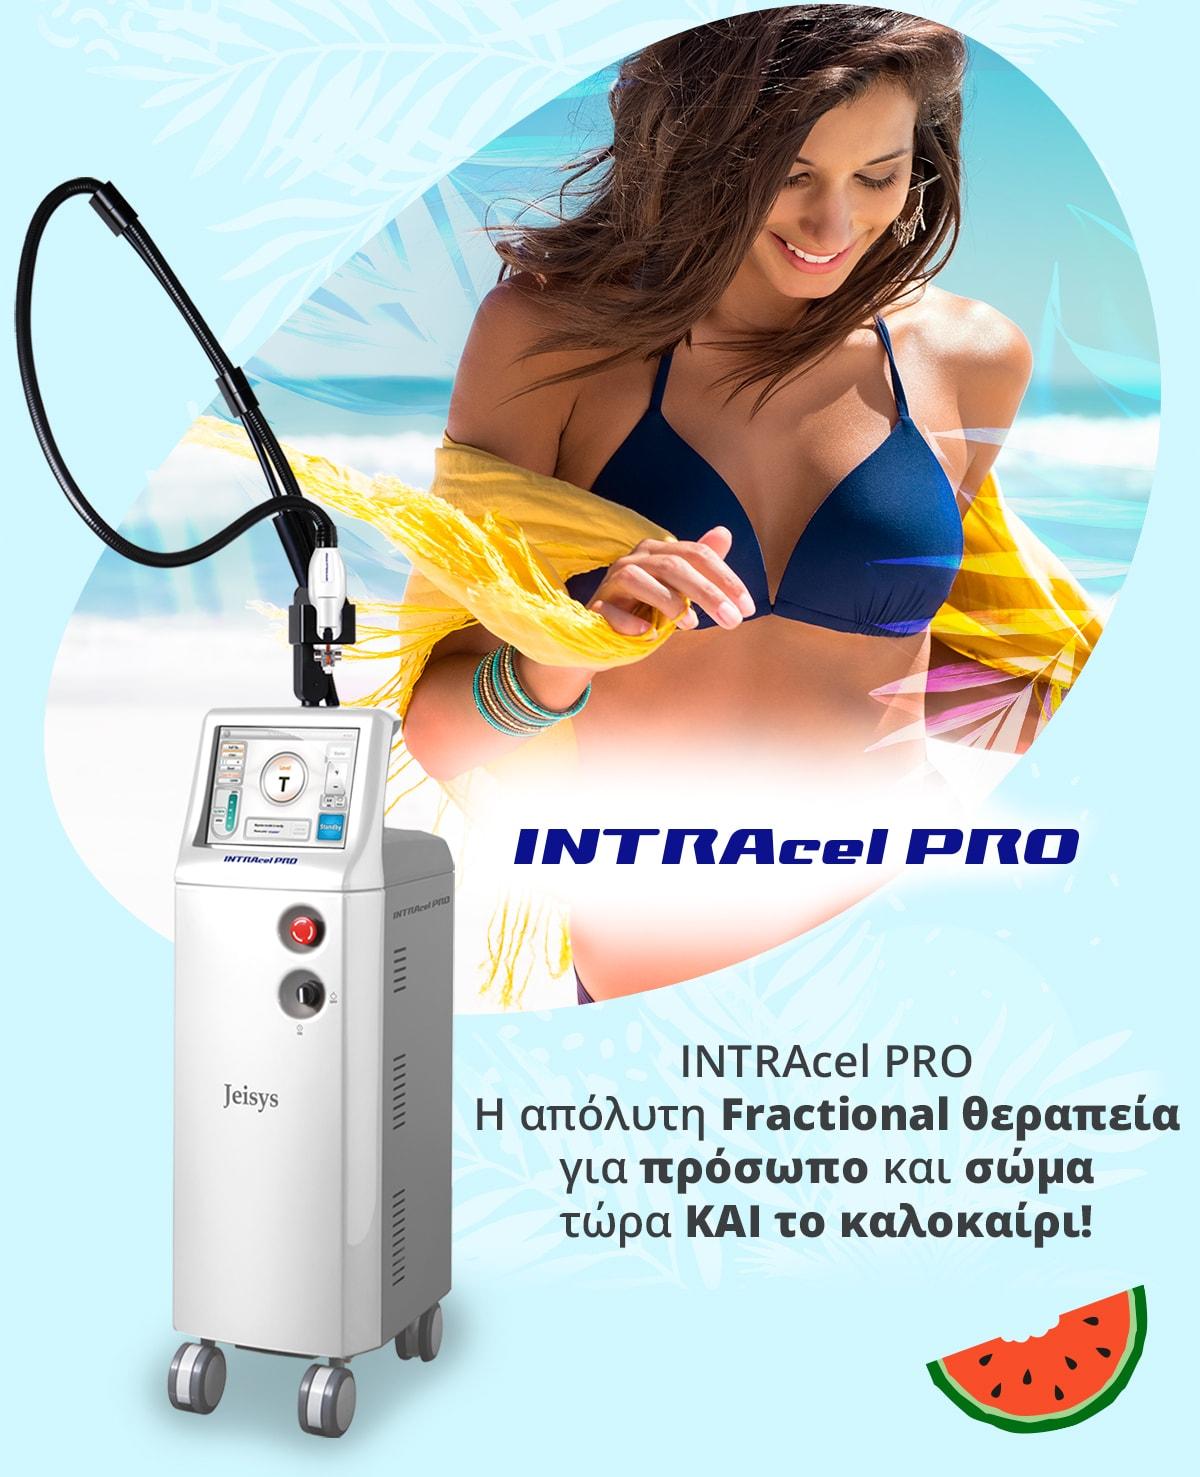 INTRAcel PRO-Η απόλυτη Fractional θεραπεία για πρόσωπο και σώμα τώρα ΚΑΙ το καλοκαίρι!